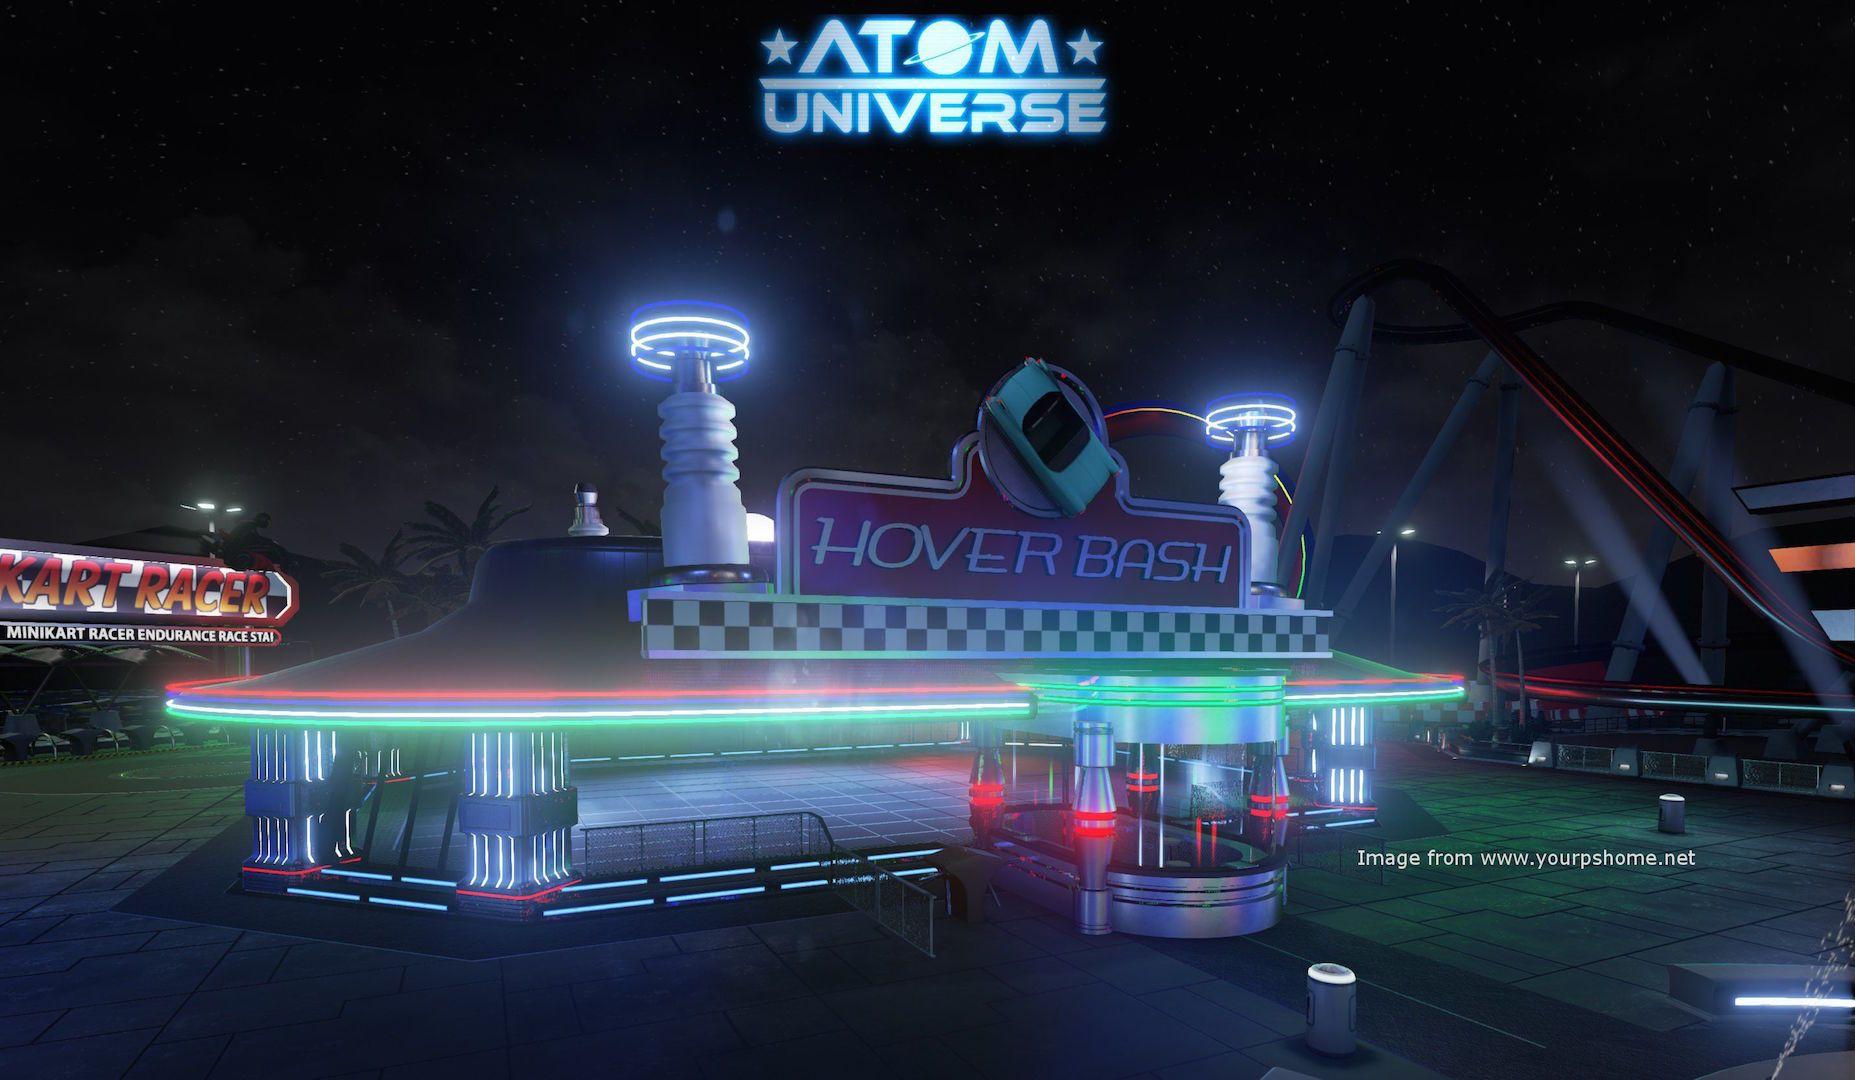 Karen Talks To Atom Republic About Atom Universe, kwoman32, Nov 30, 2014, 4:55 PM, YourPSHome.net, jpg, HoverBash-copy.jpg